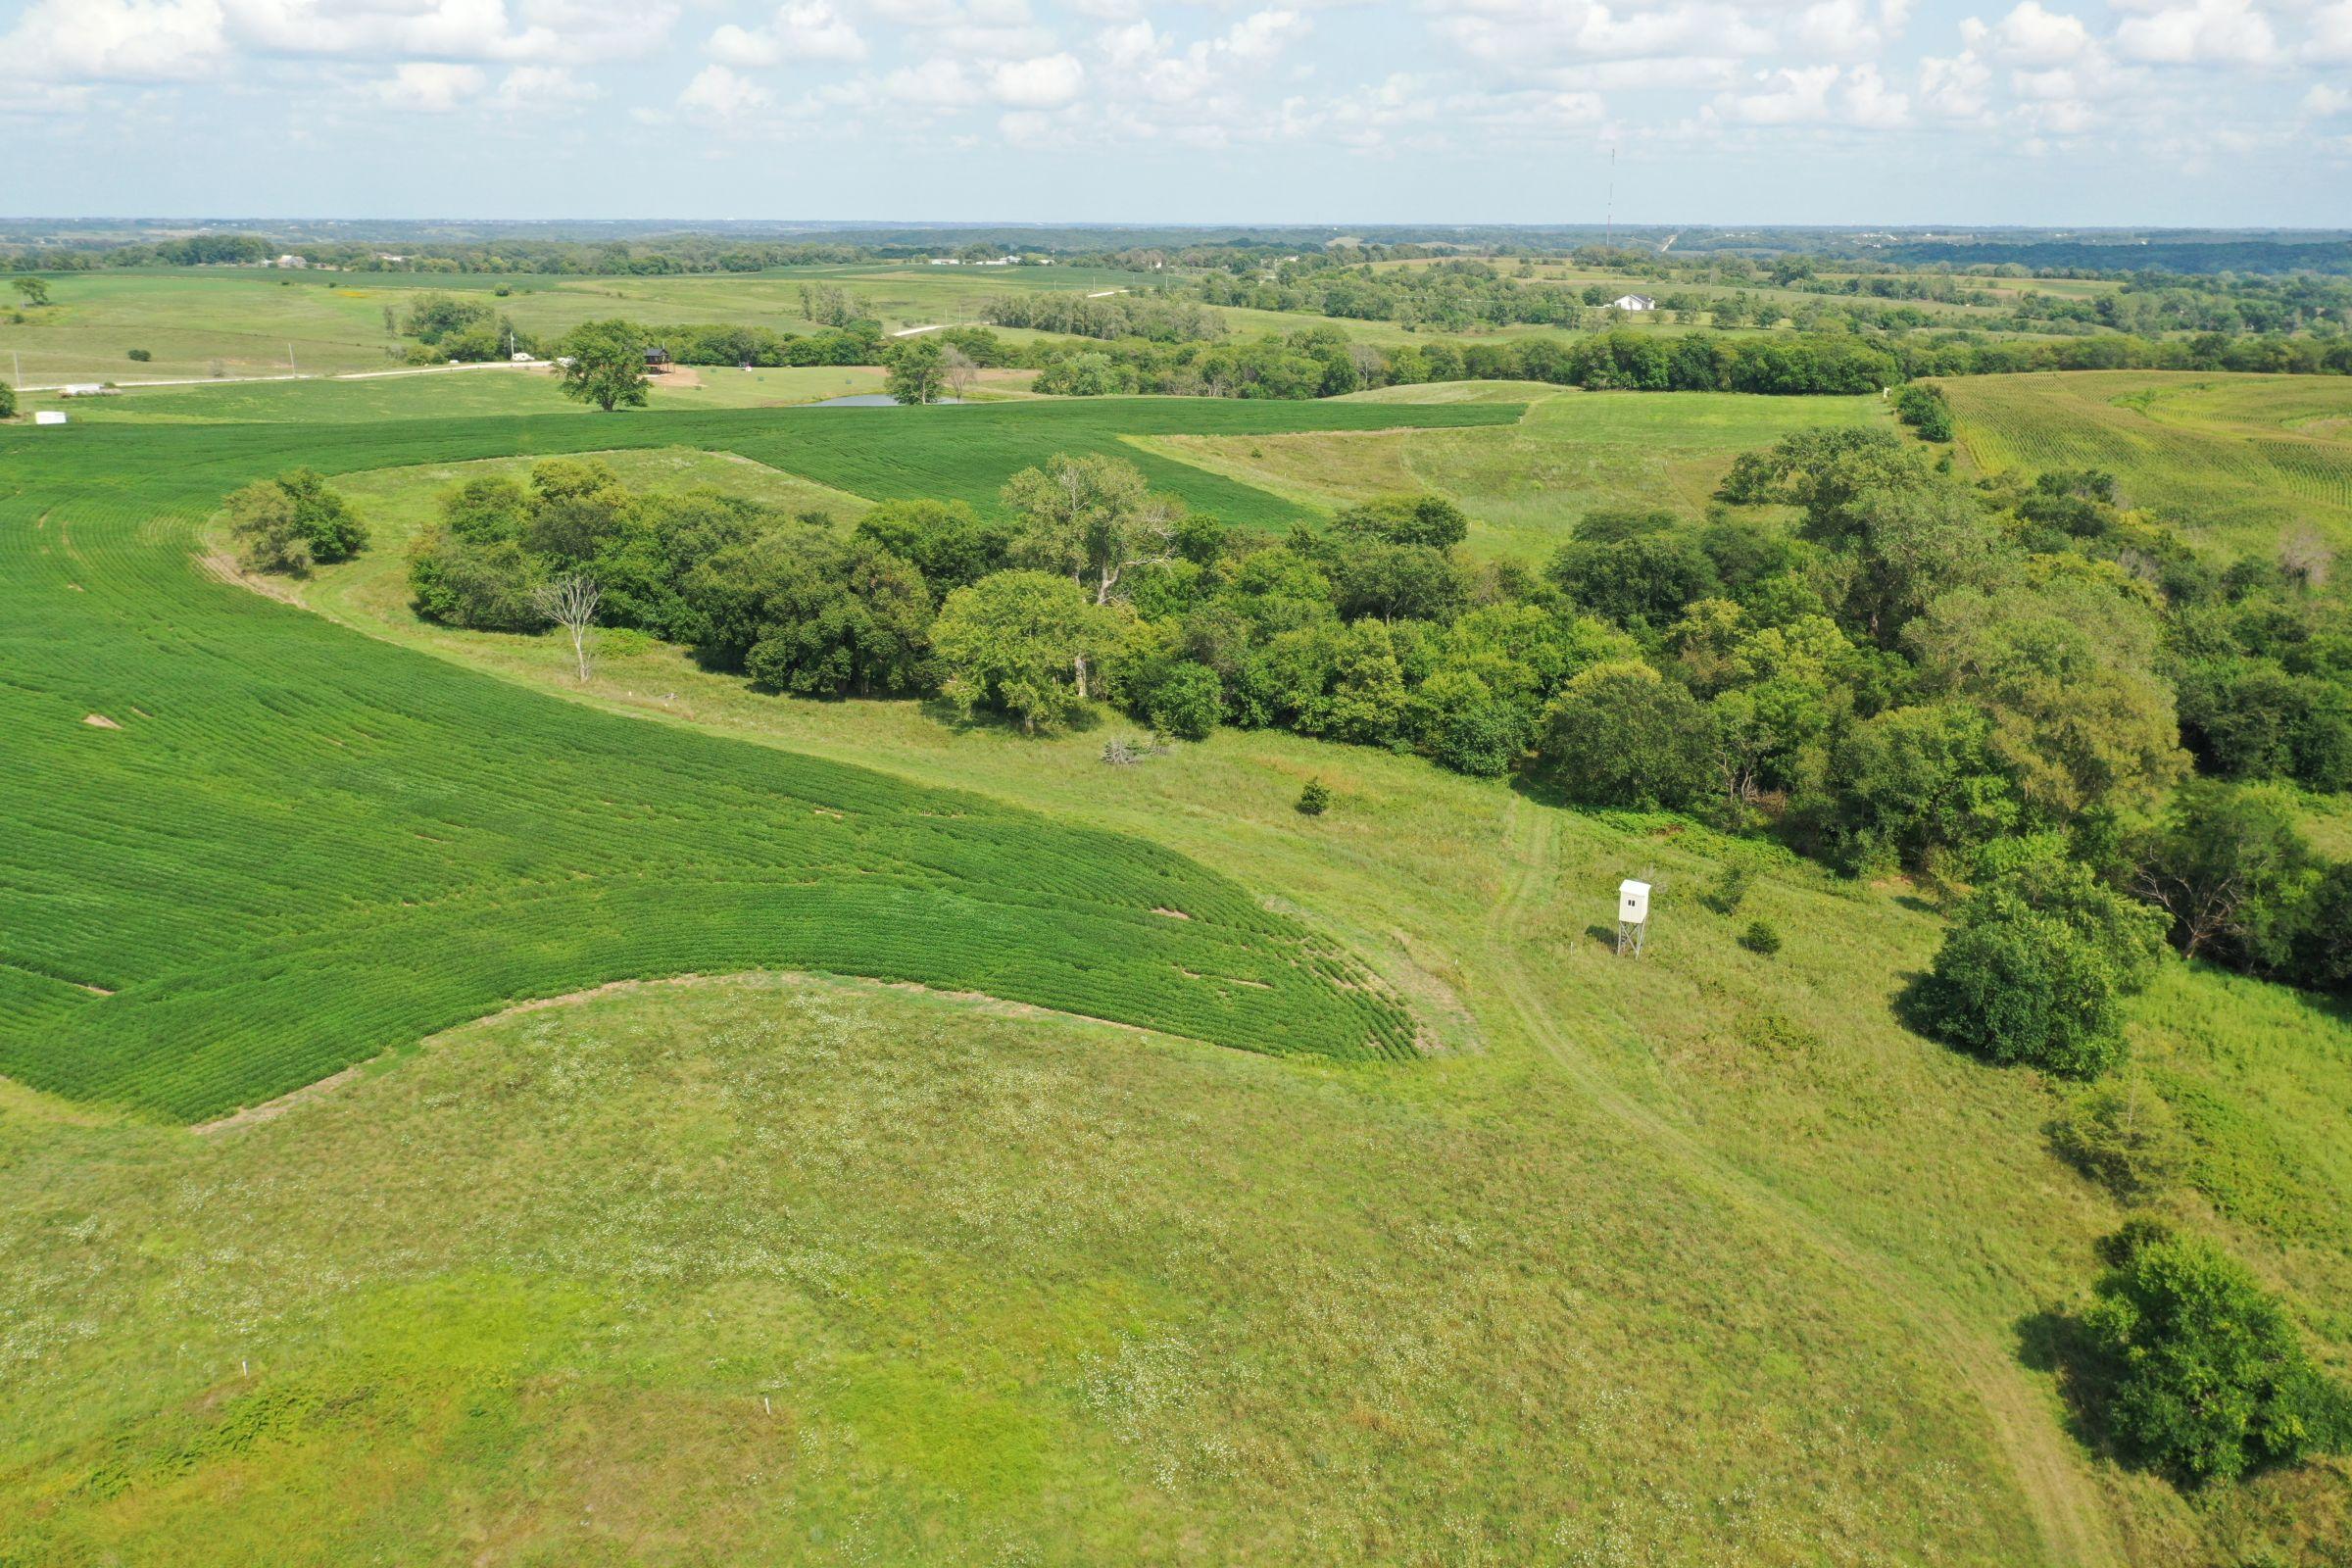 land-warren-county-iowa-8-acres-listing-number-15695-2-2021-09-01-185949.JPG